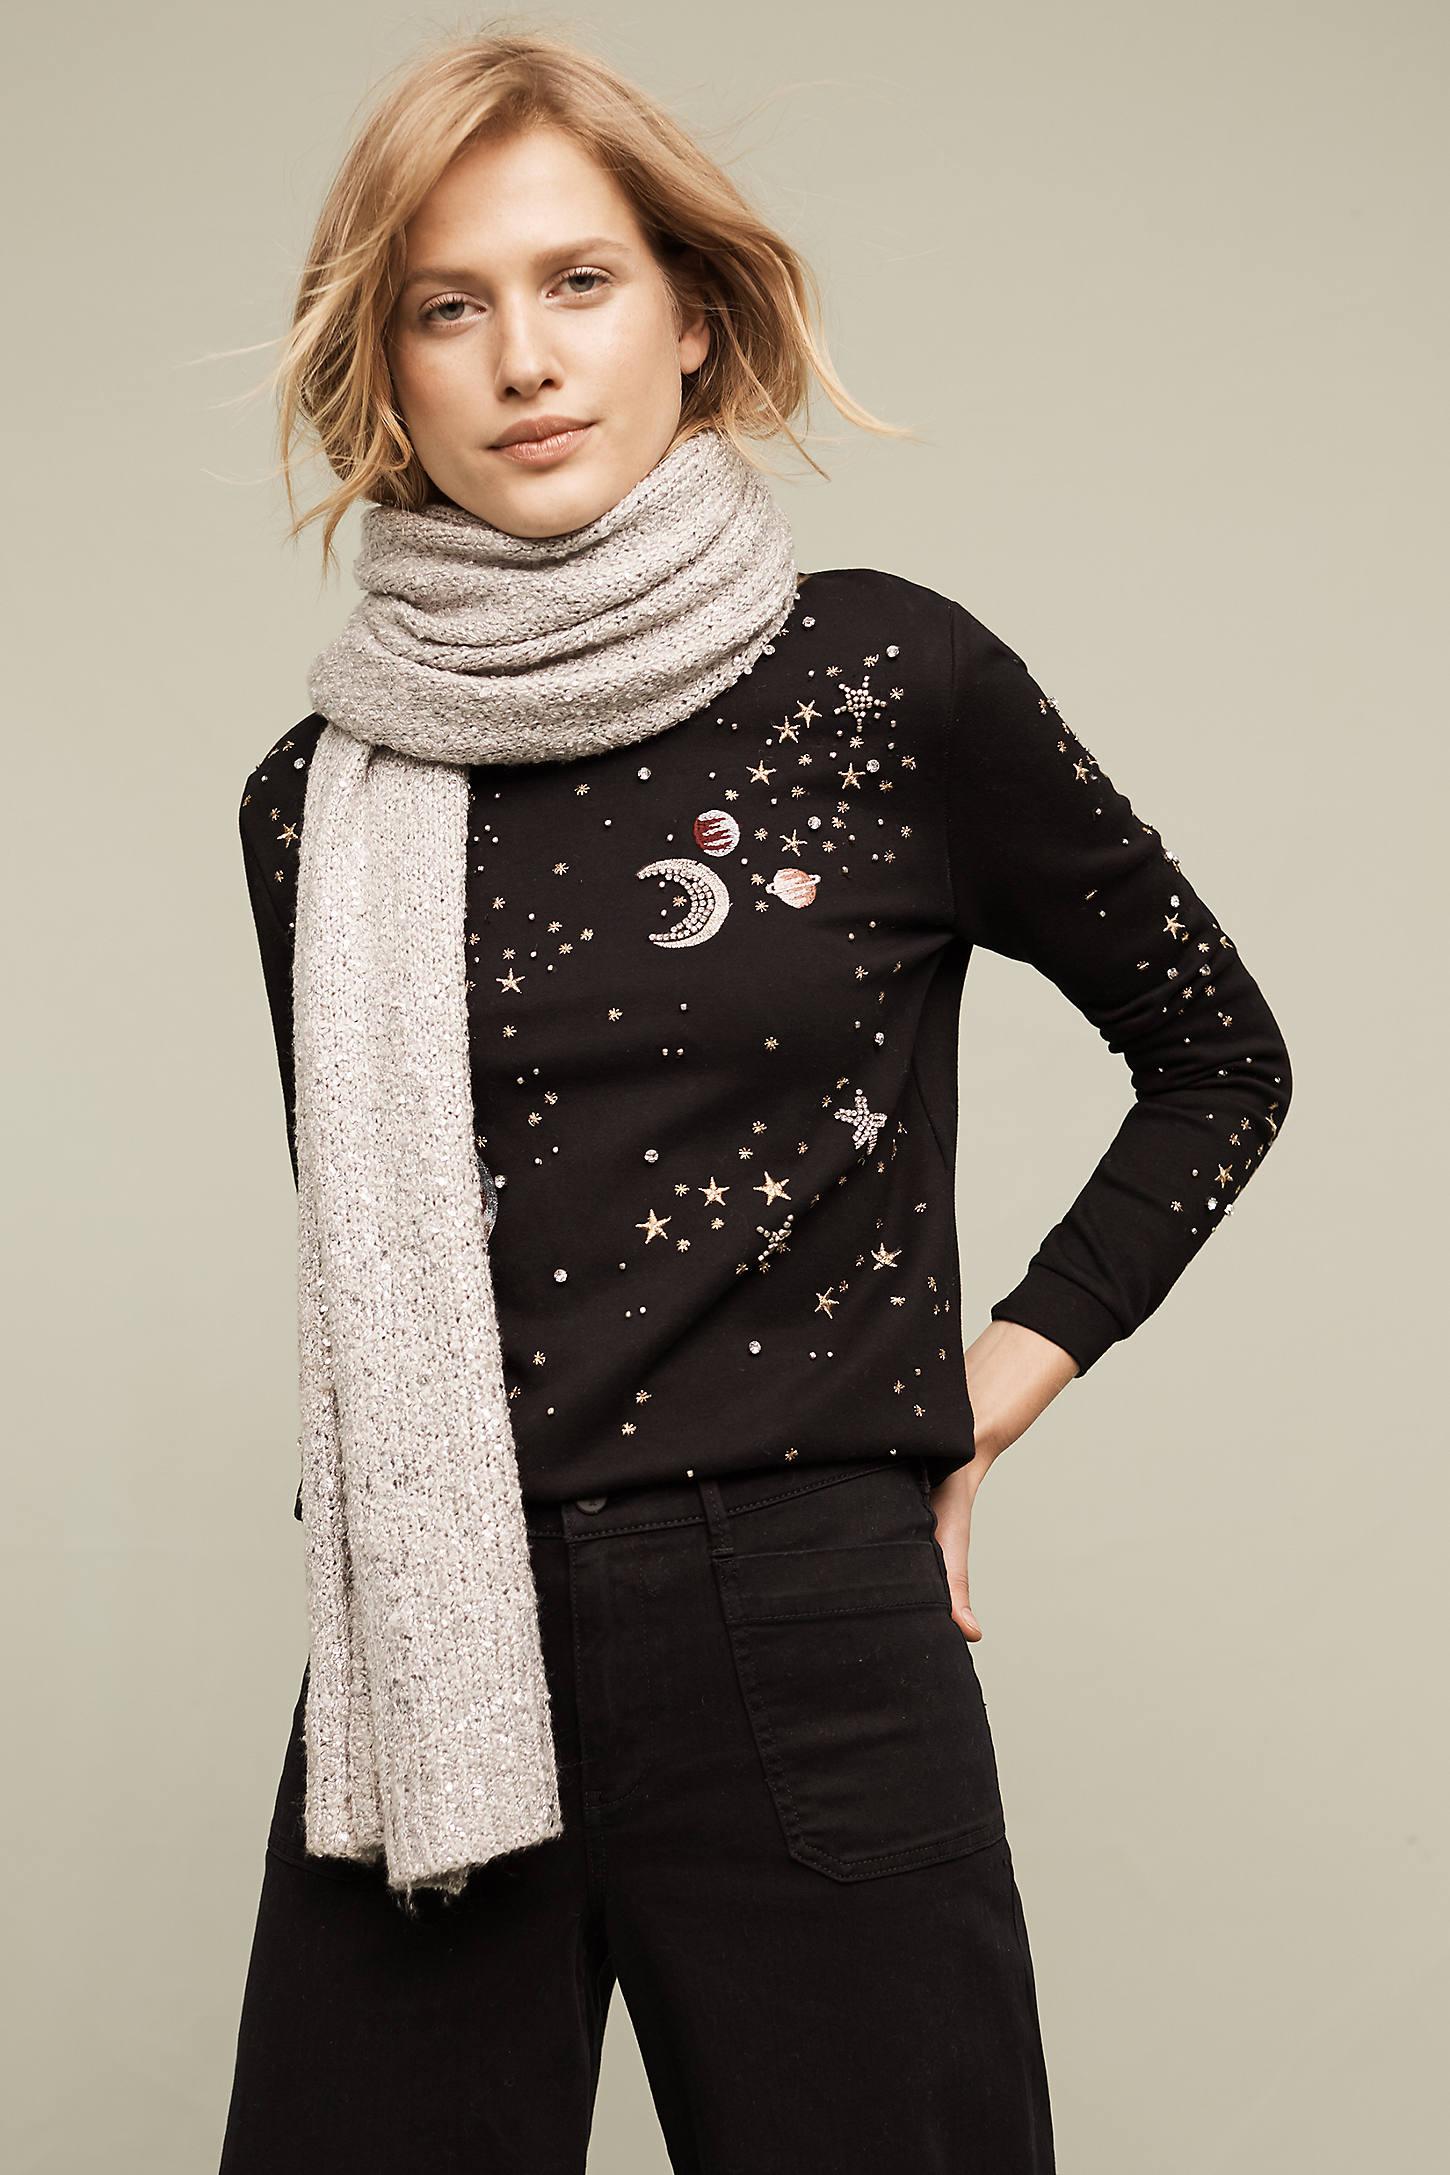 Stargazer Pullover